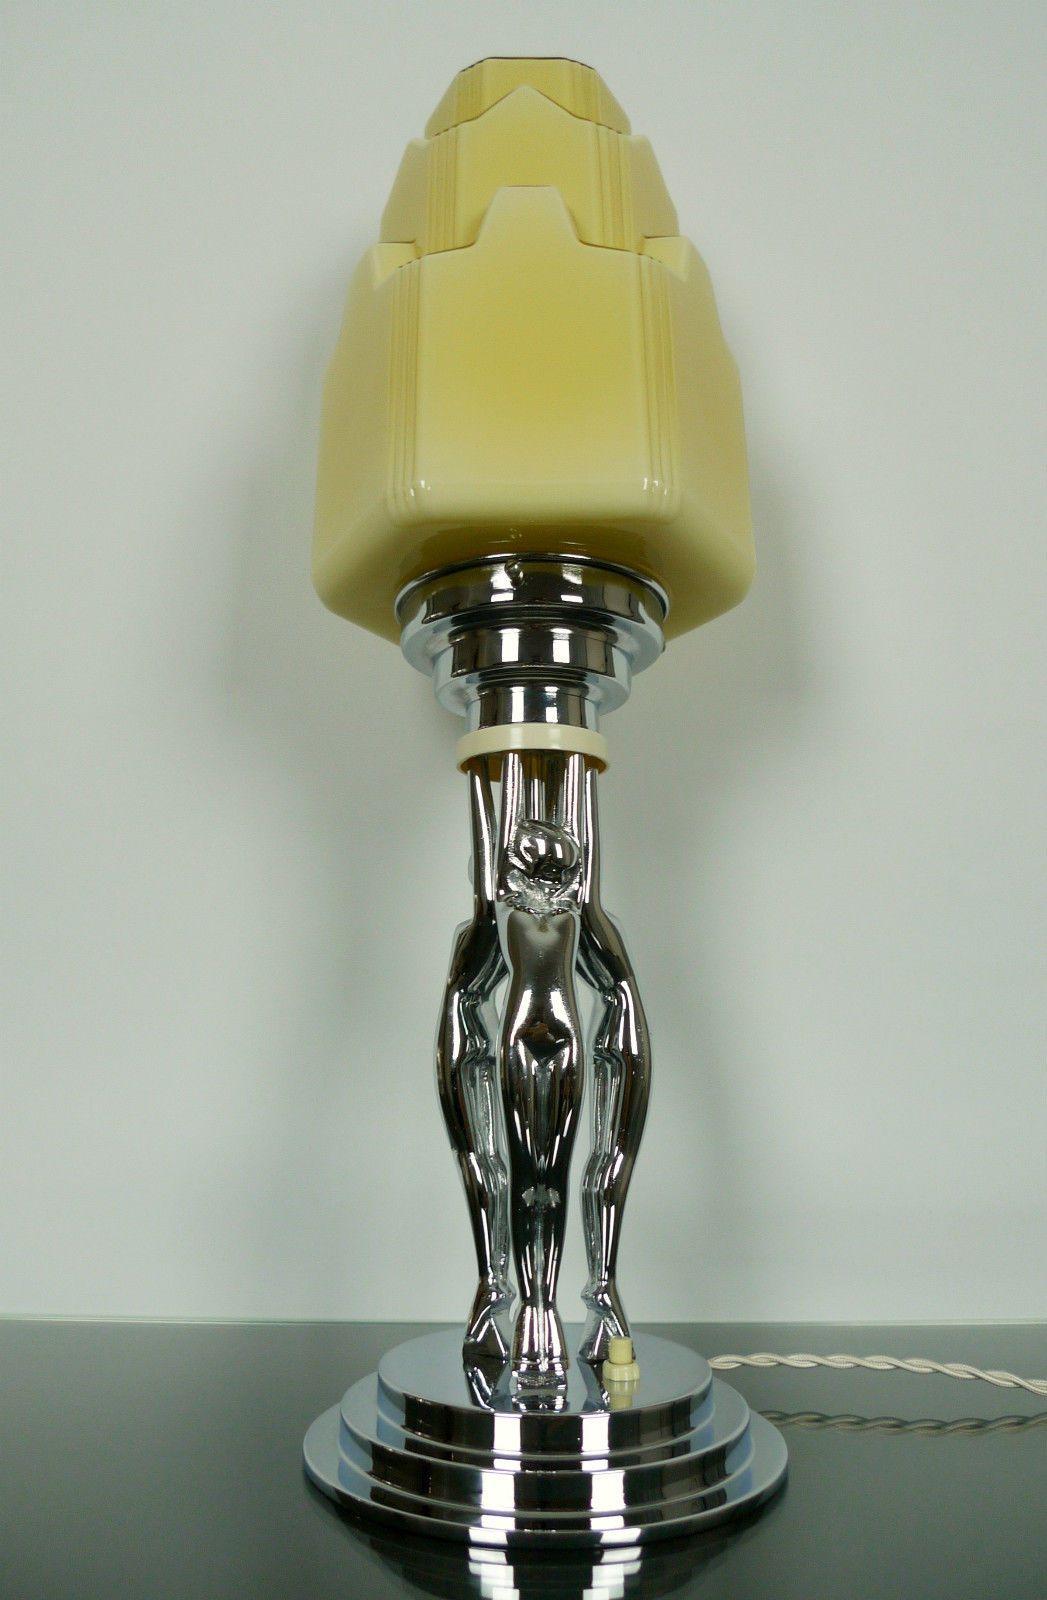 Art Deco Triple Diana Lady Lamp Antique 1930s Chrome Bakelite Skyscraper Shade Art Deco Lighting Art Deco Lamps Elegant Art